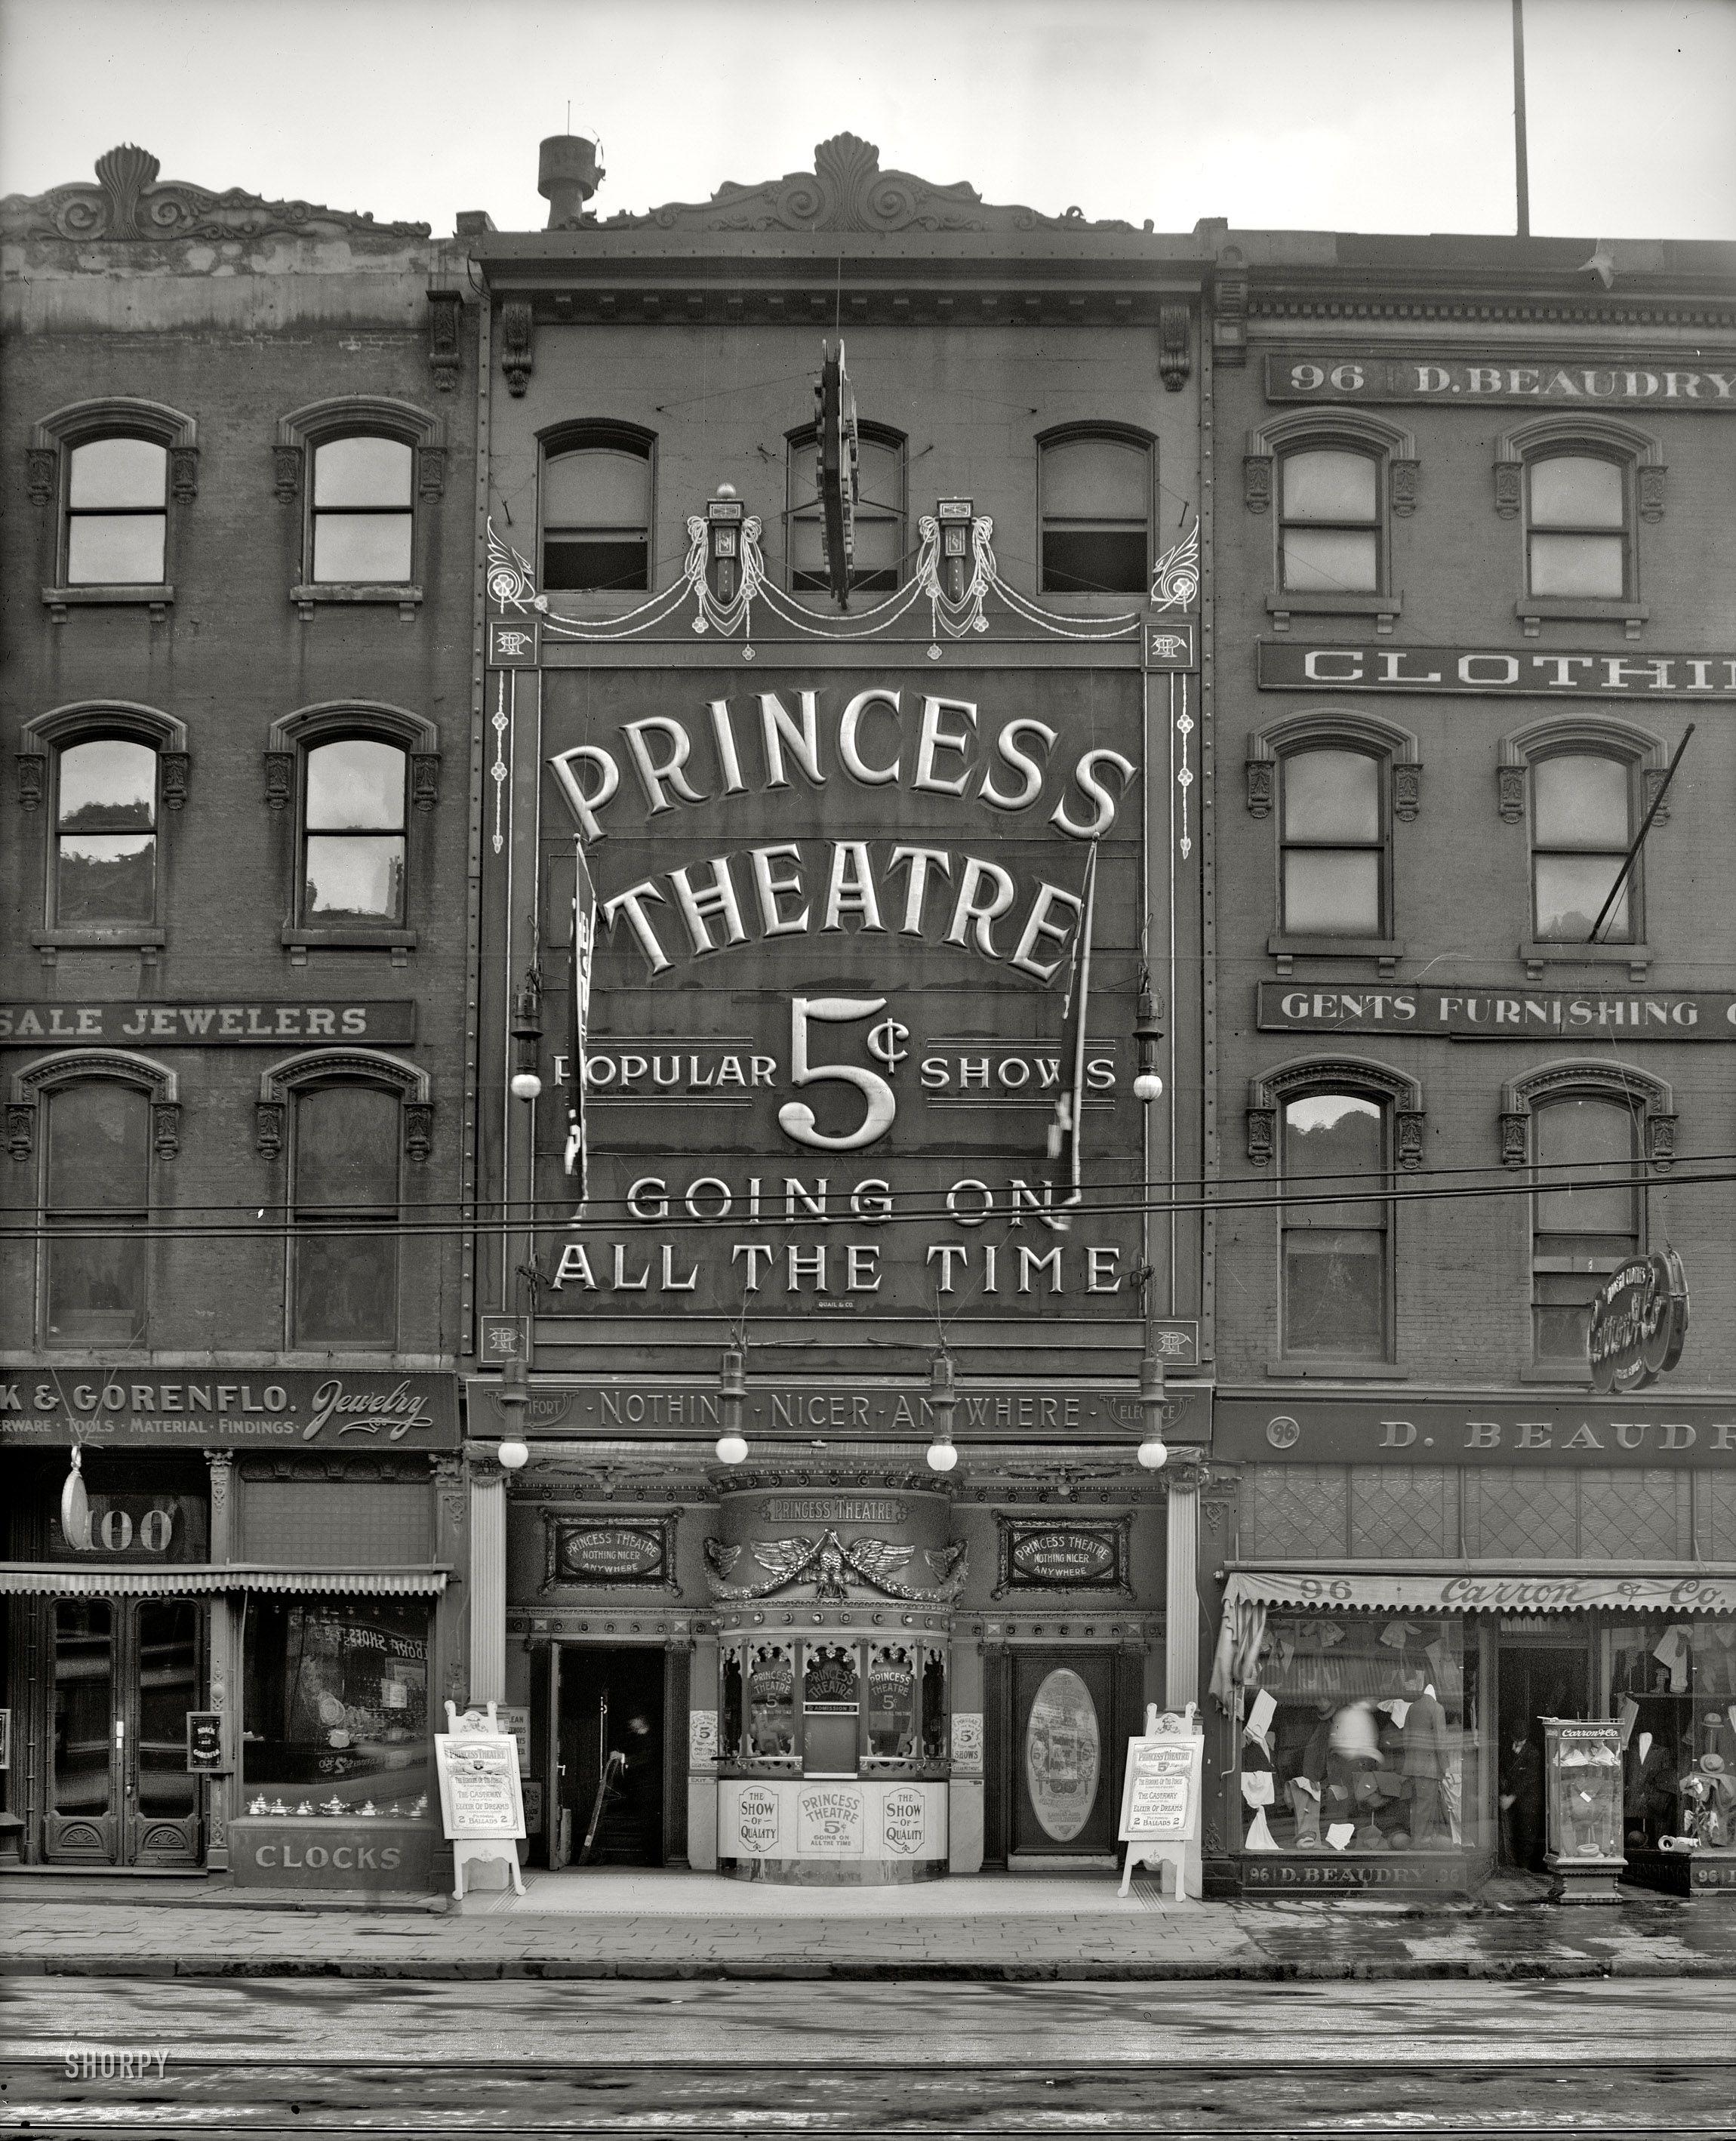 Princess Theatre (Detroit, MI, 1909) via http://www.shorpy.com/node/9474